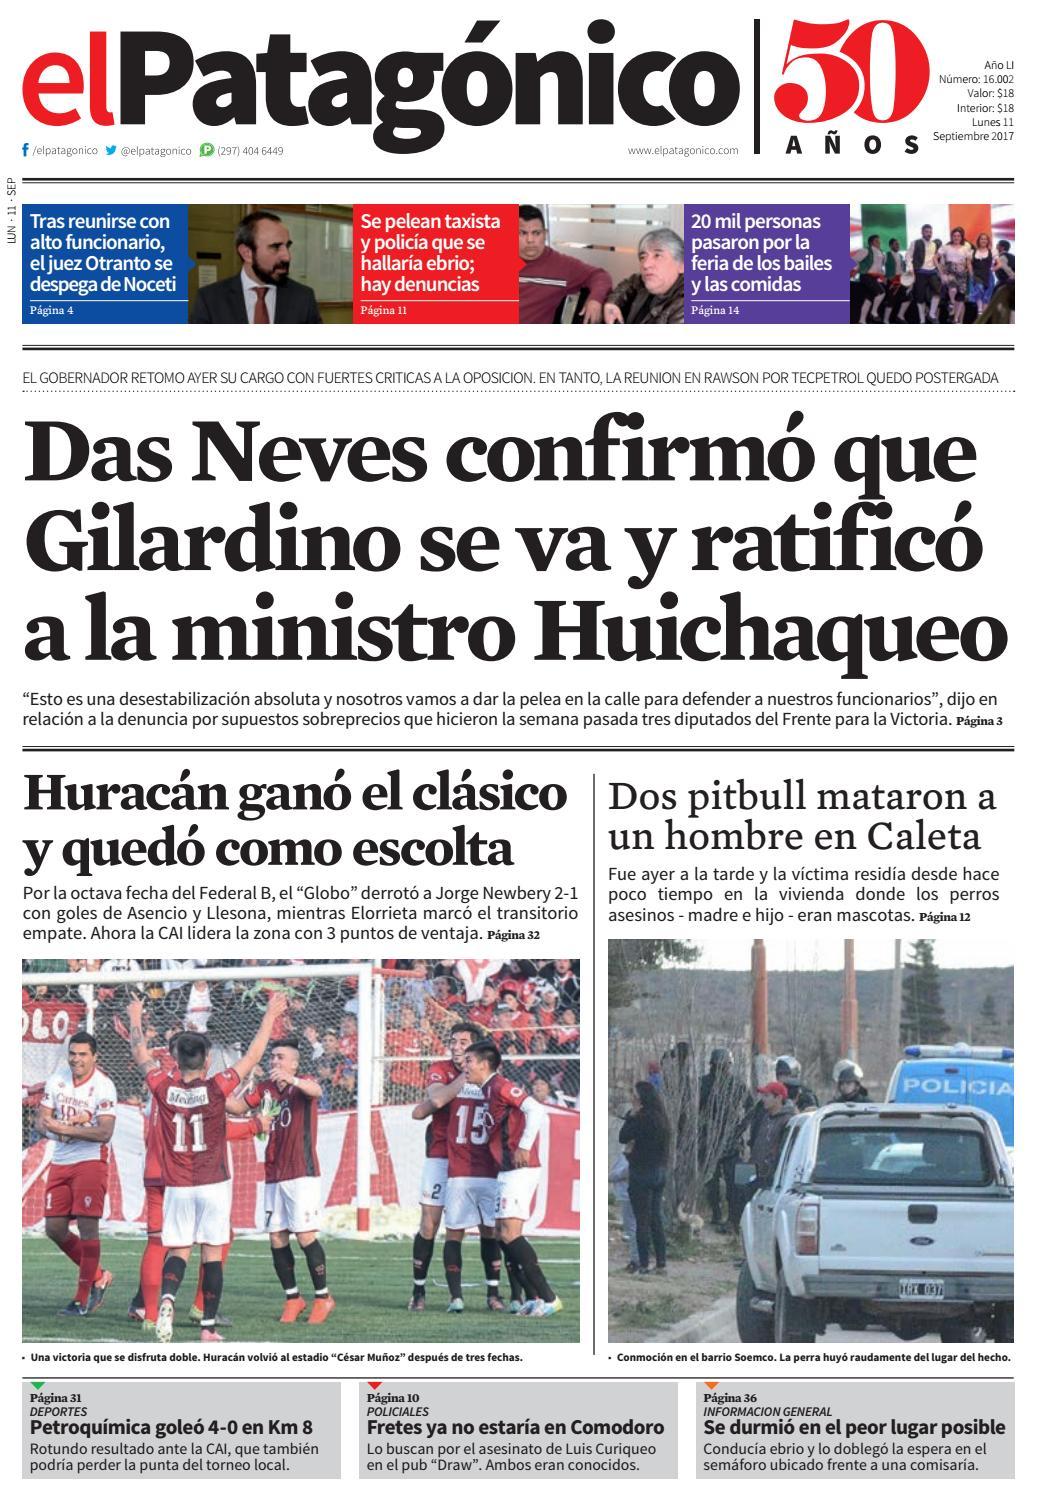 edicion230610092017.pdf by El Patagonico - issuu